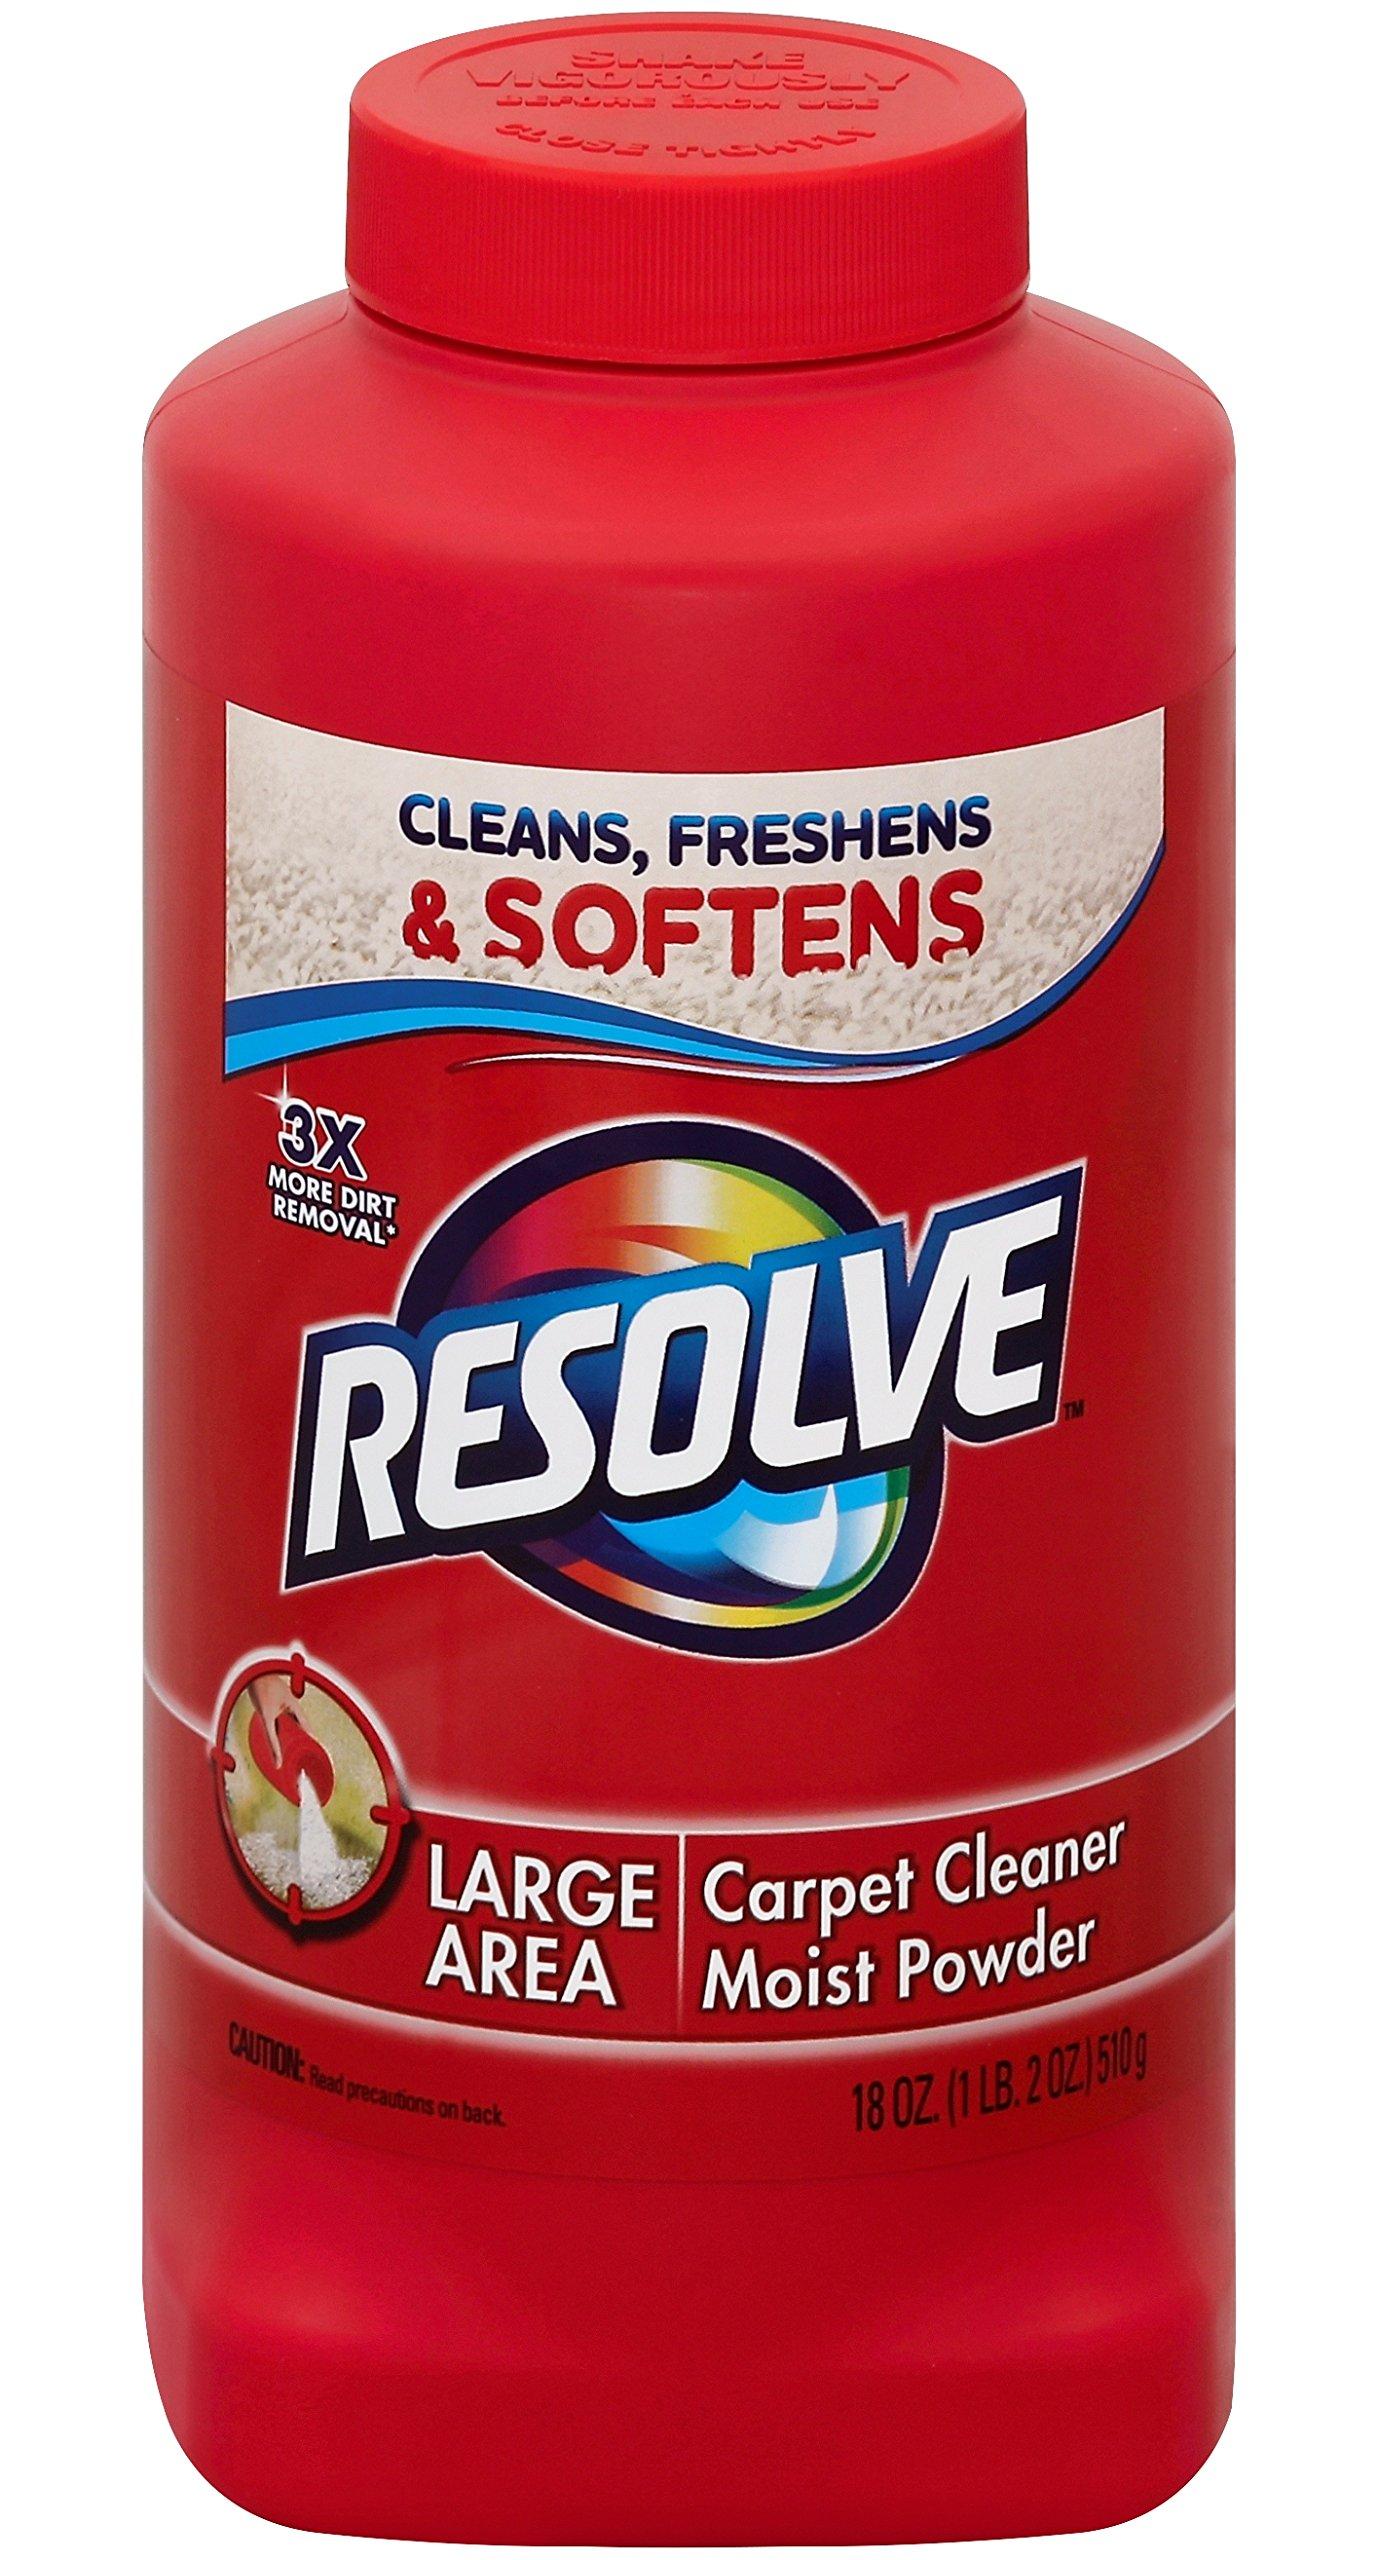 Resolve Carpet Cleaner Powder, 18 oz Bottle, For Dirt & Stain Removal